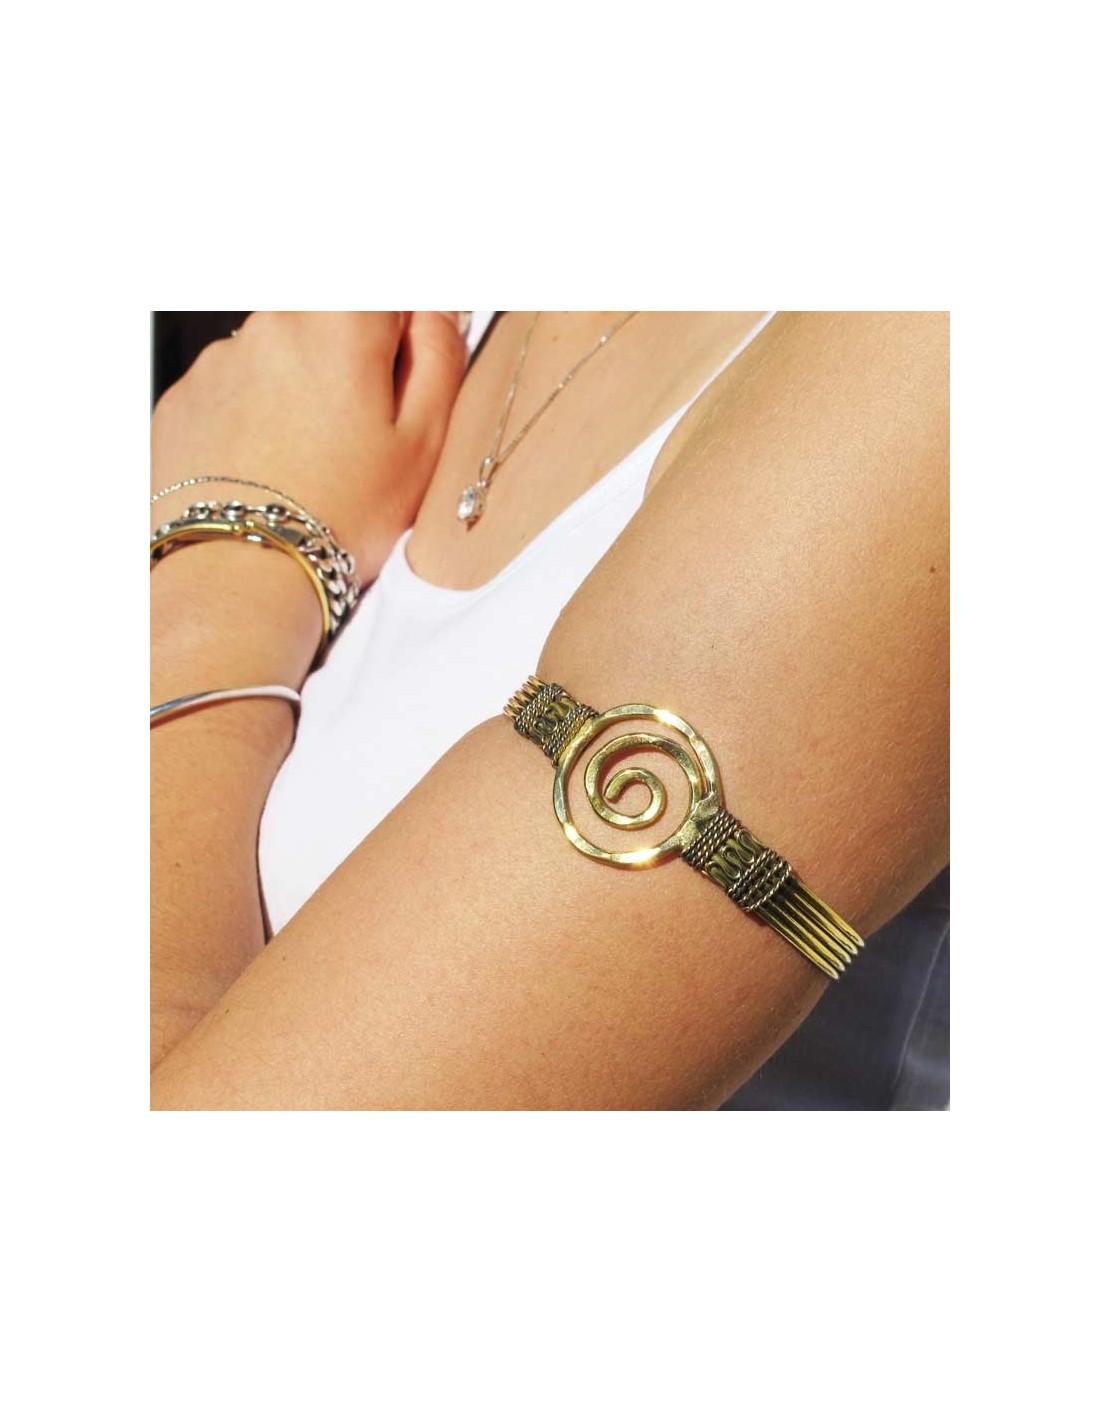 Bracelets De Cheville Bracelets De Cheville En Argent Avec Spirales Et 1 Sonnette